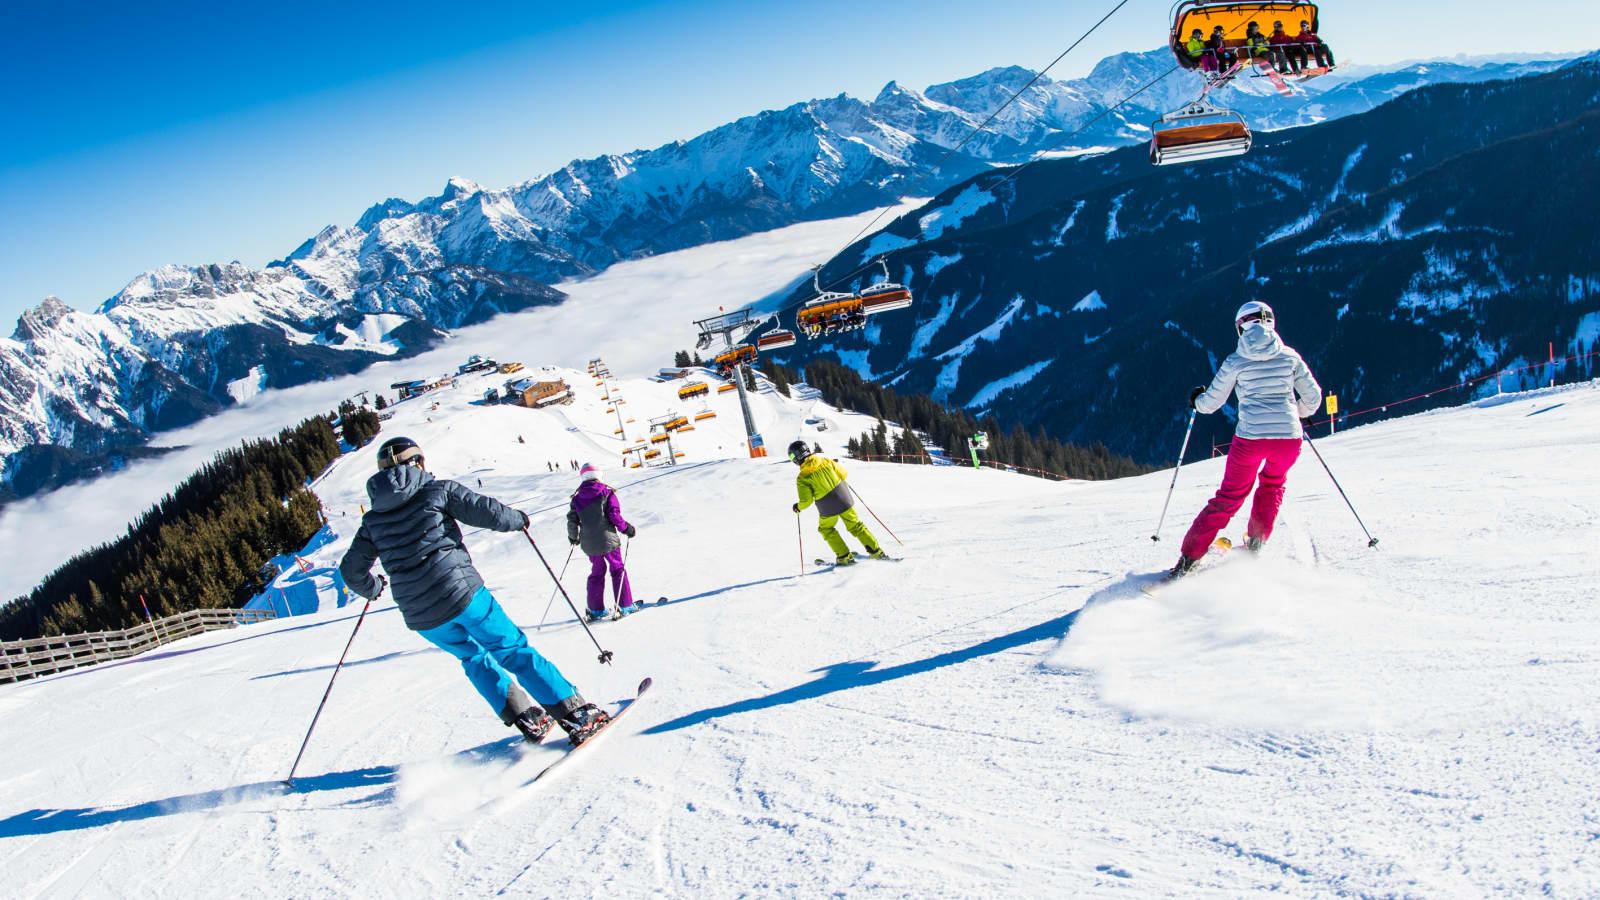 ski holidays to austria   topflight   ireland's no.1 ski operator